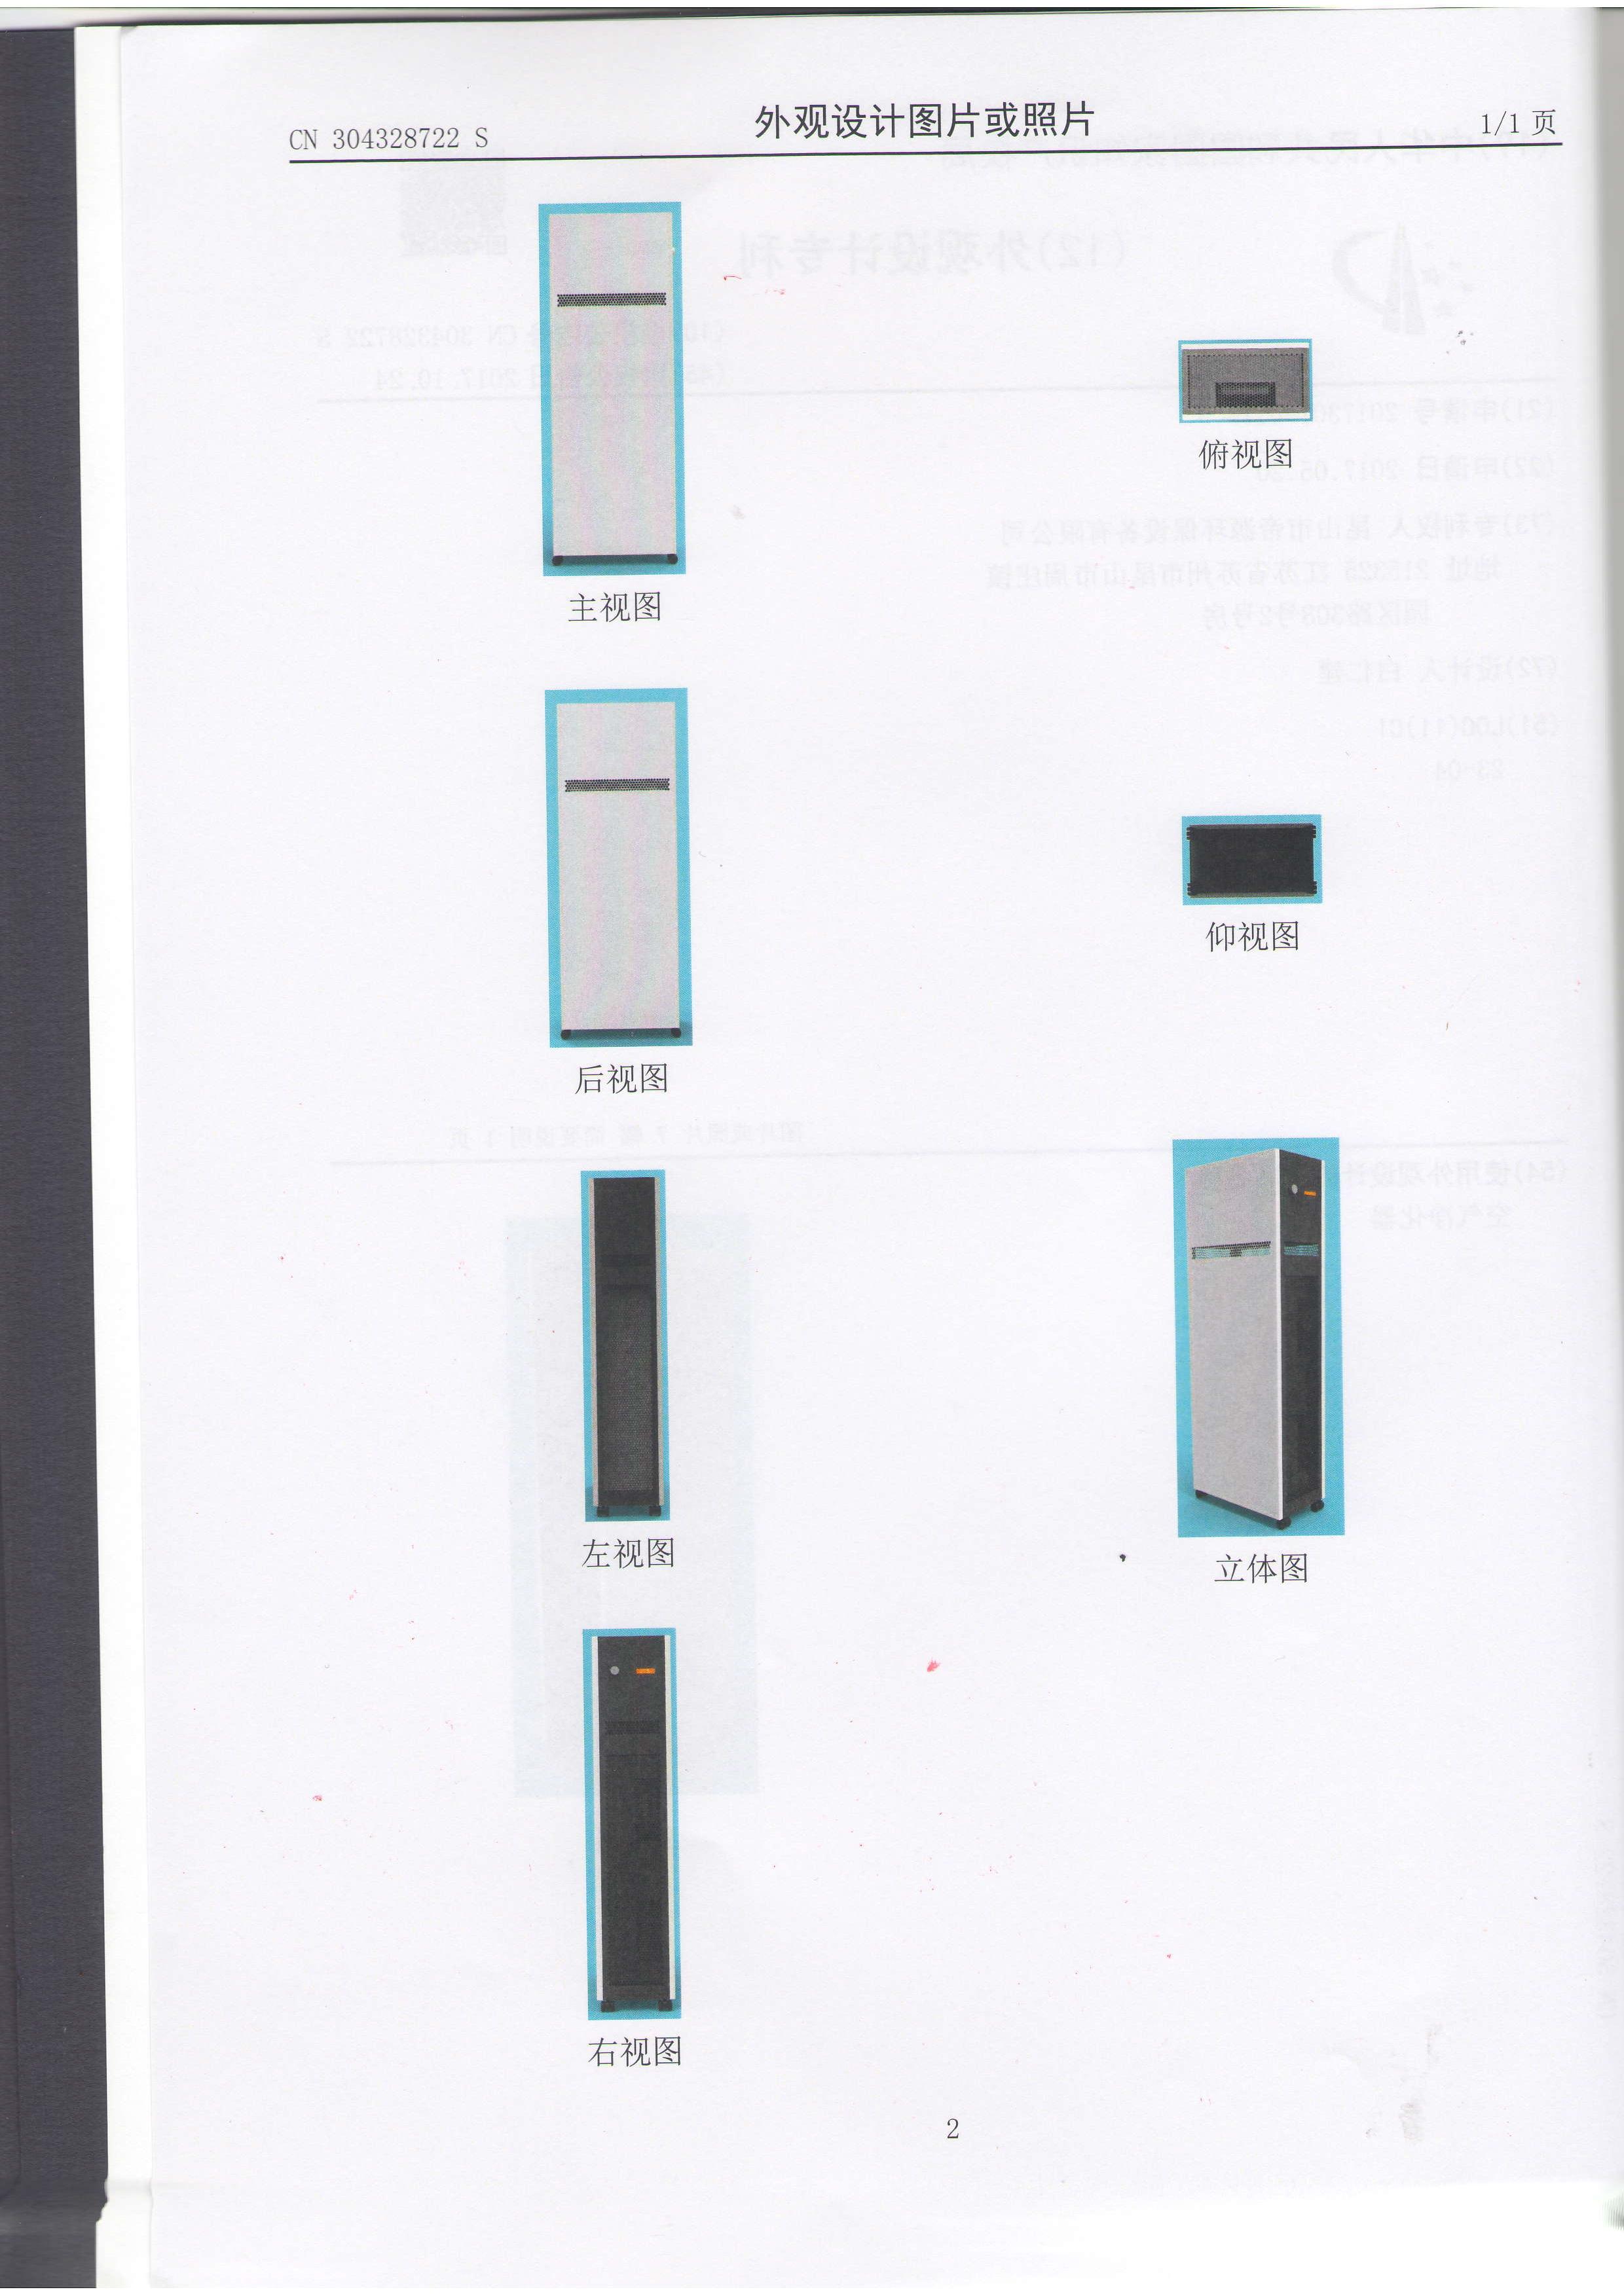 101820135250_0DY880外观设计专利_4.jpg